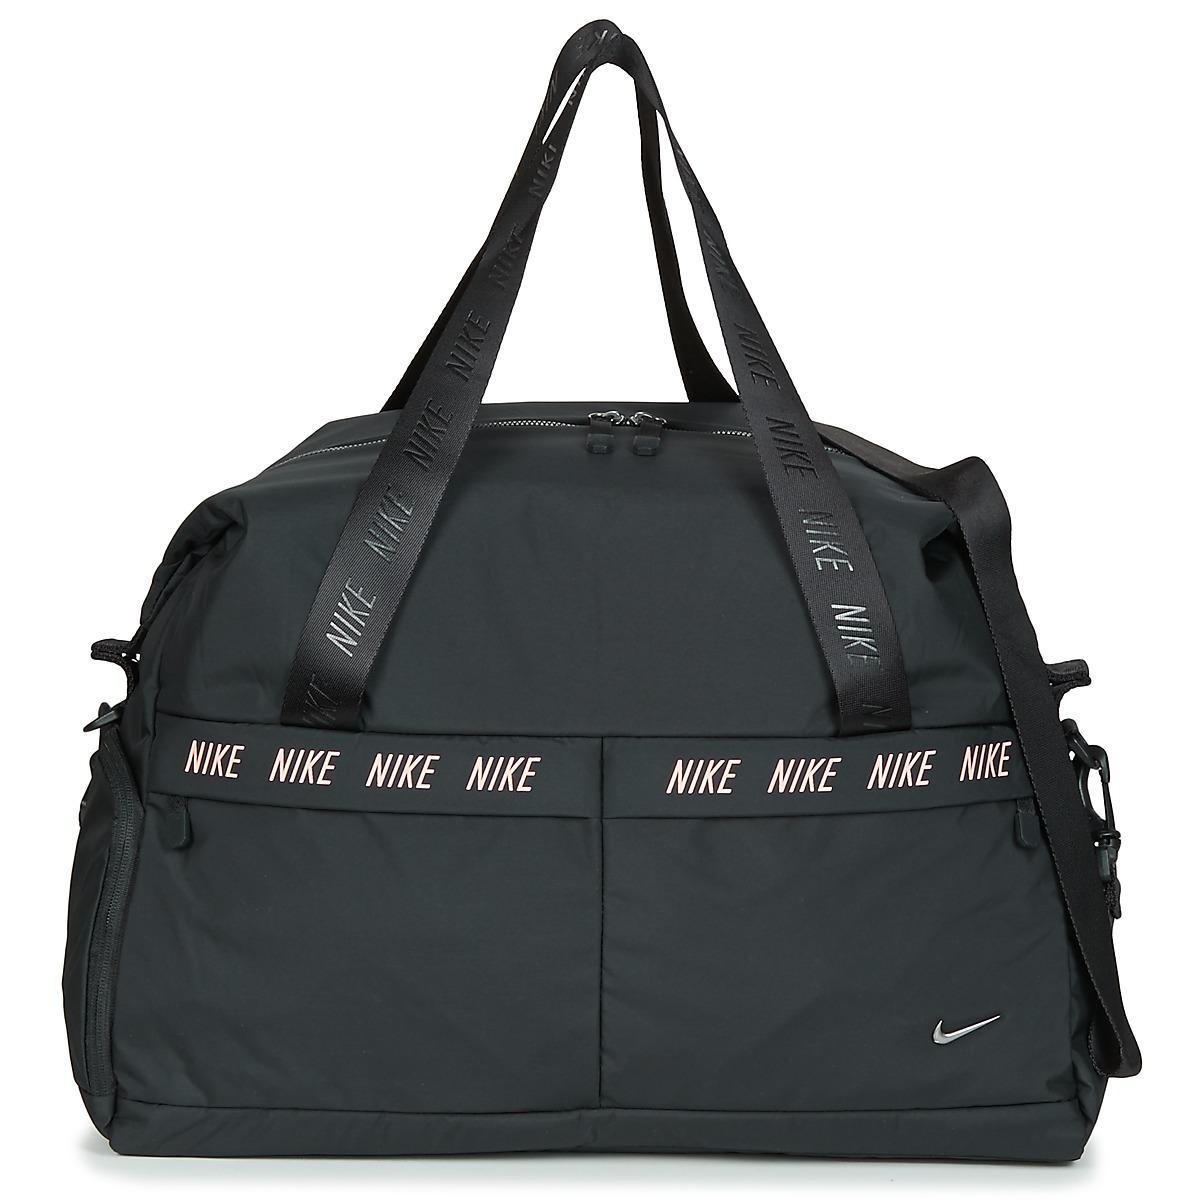 0e8fef66a026b0 Womens Legend Club Training Bag ... best service 20853 09fdf ...